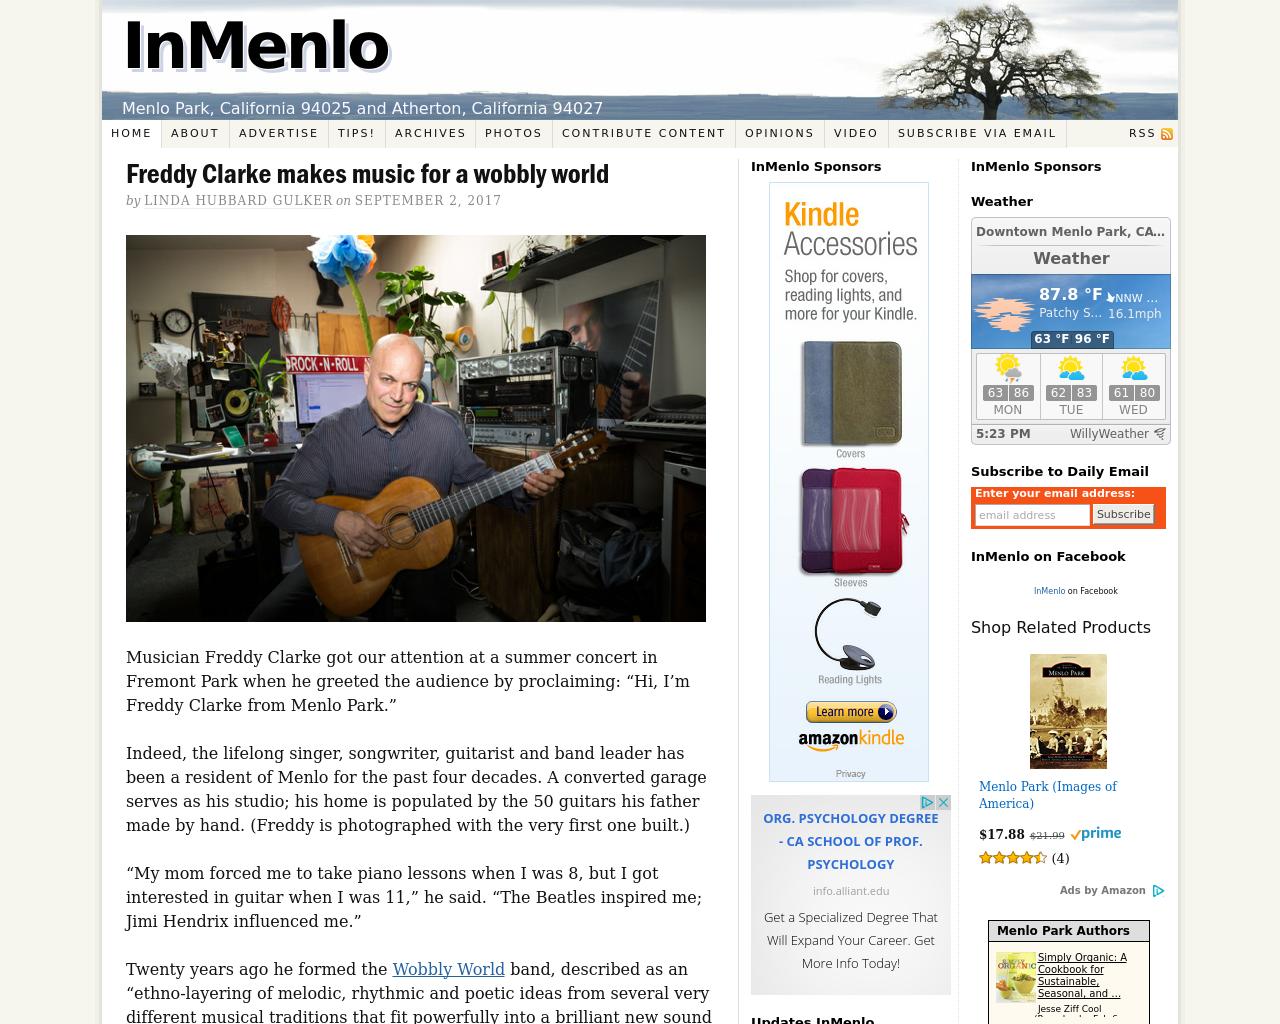 InMenlo-Advertising-Reviews-Pricing